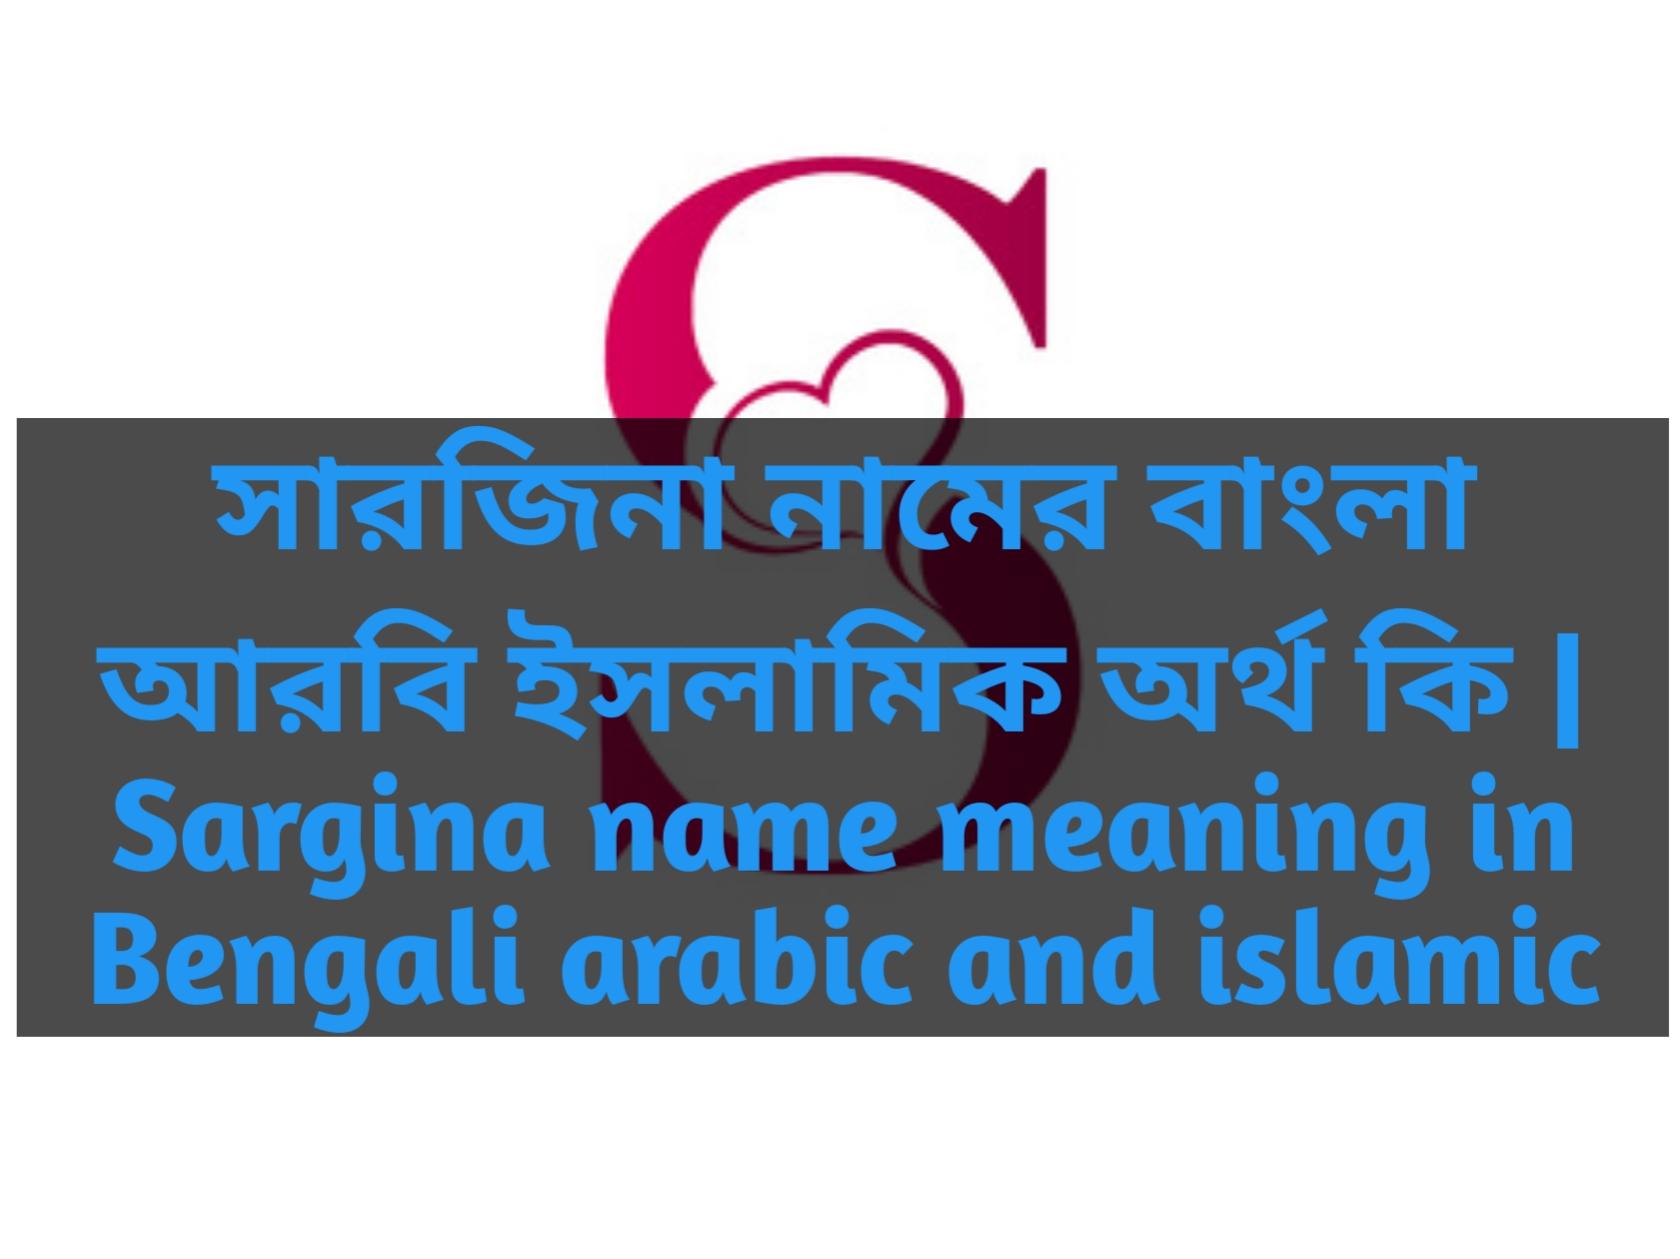 Sargina name meaning in Bengali, সারজিনা নামের অর্থ কি, সারজিনা নামের বাংলা অর্থ কি, সারজিনা নামের ইসলামিক অর্থ কি,